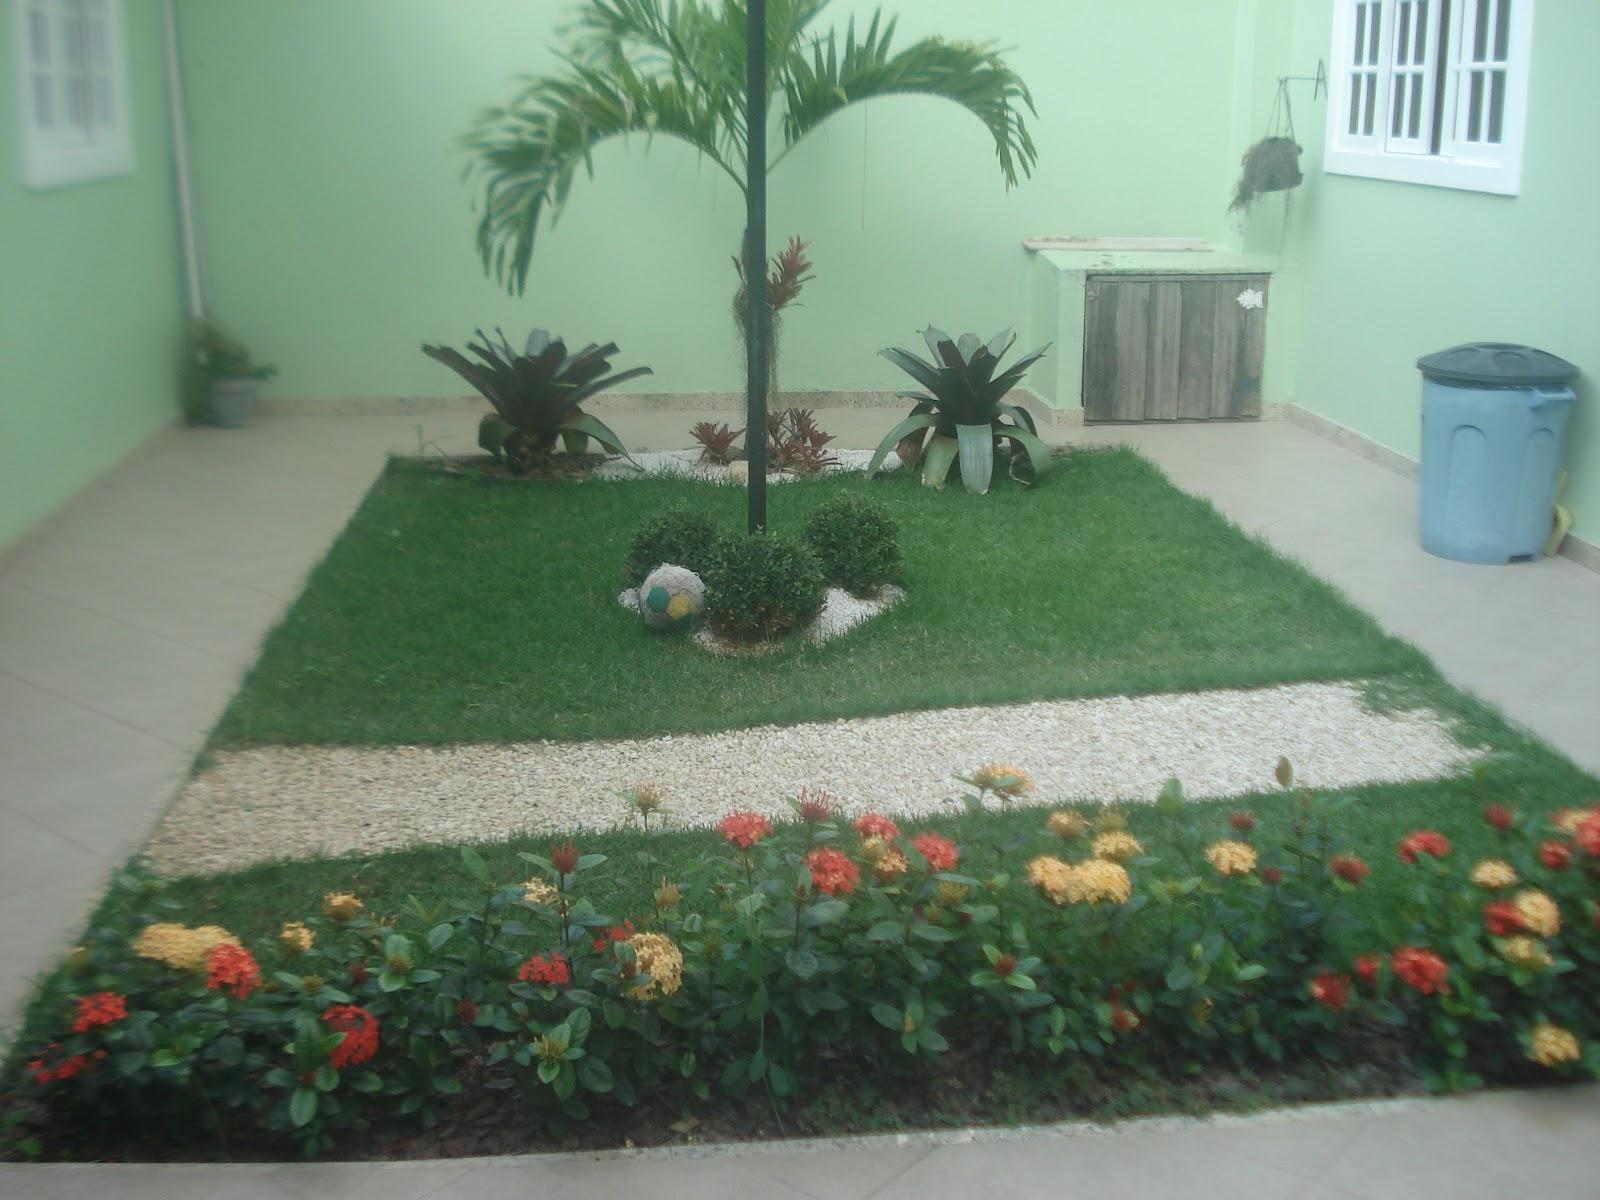 Valor R$ 490.000 00 .Visitas agendadas. #743E31 1600x1200 Armario Banheiro Blindex